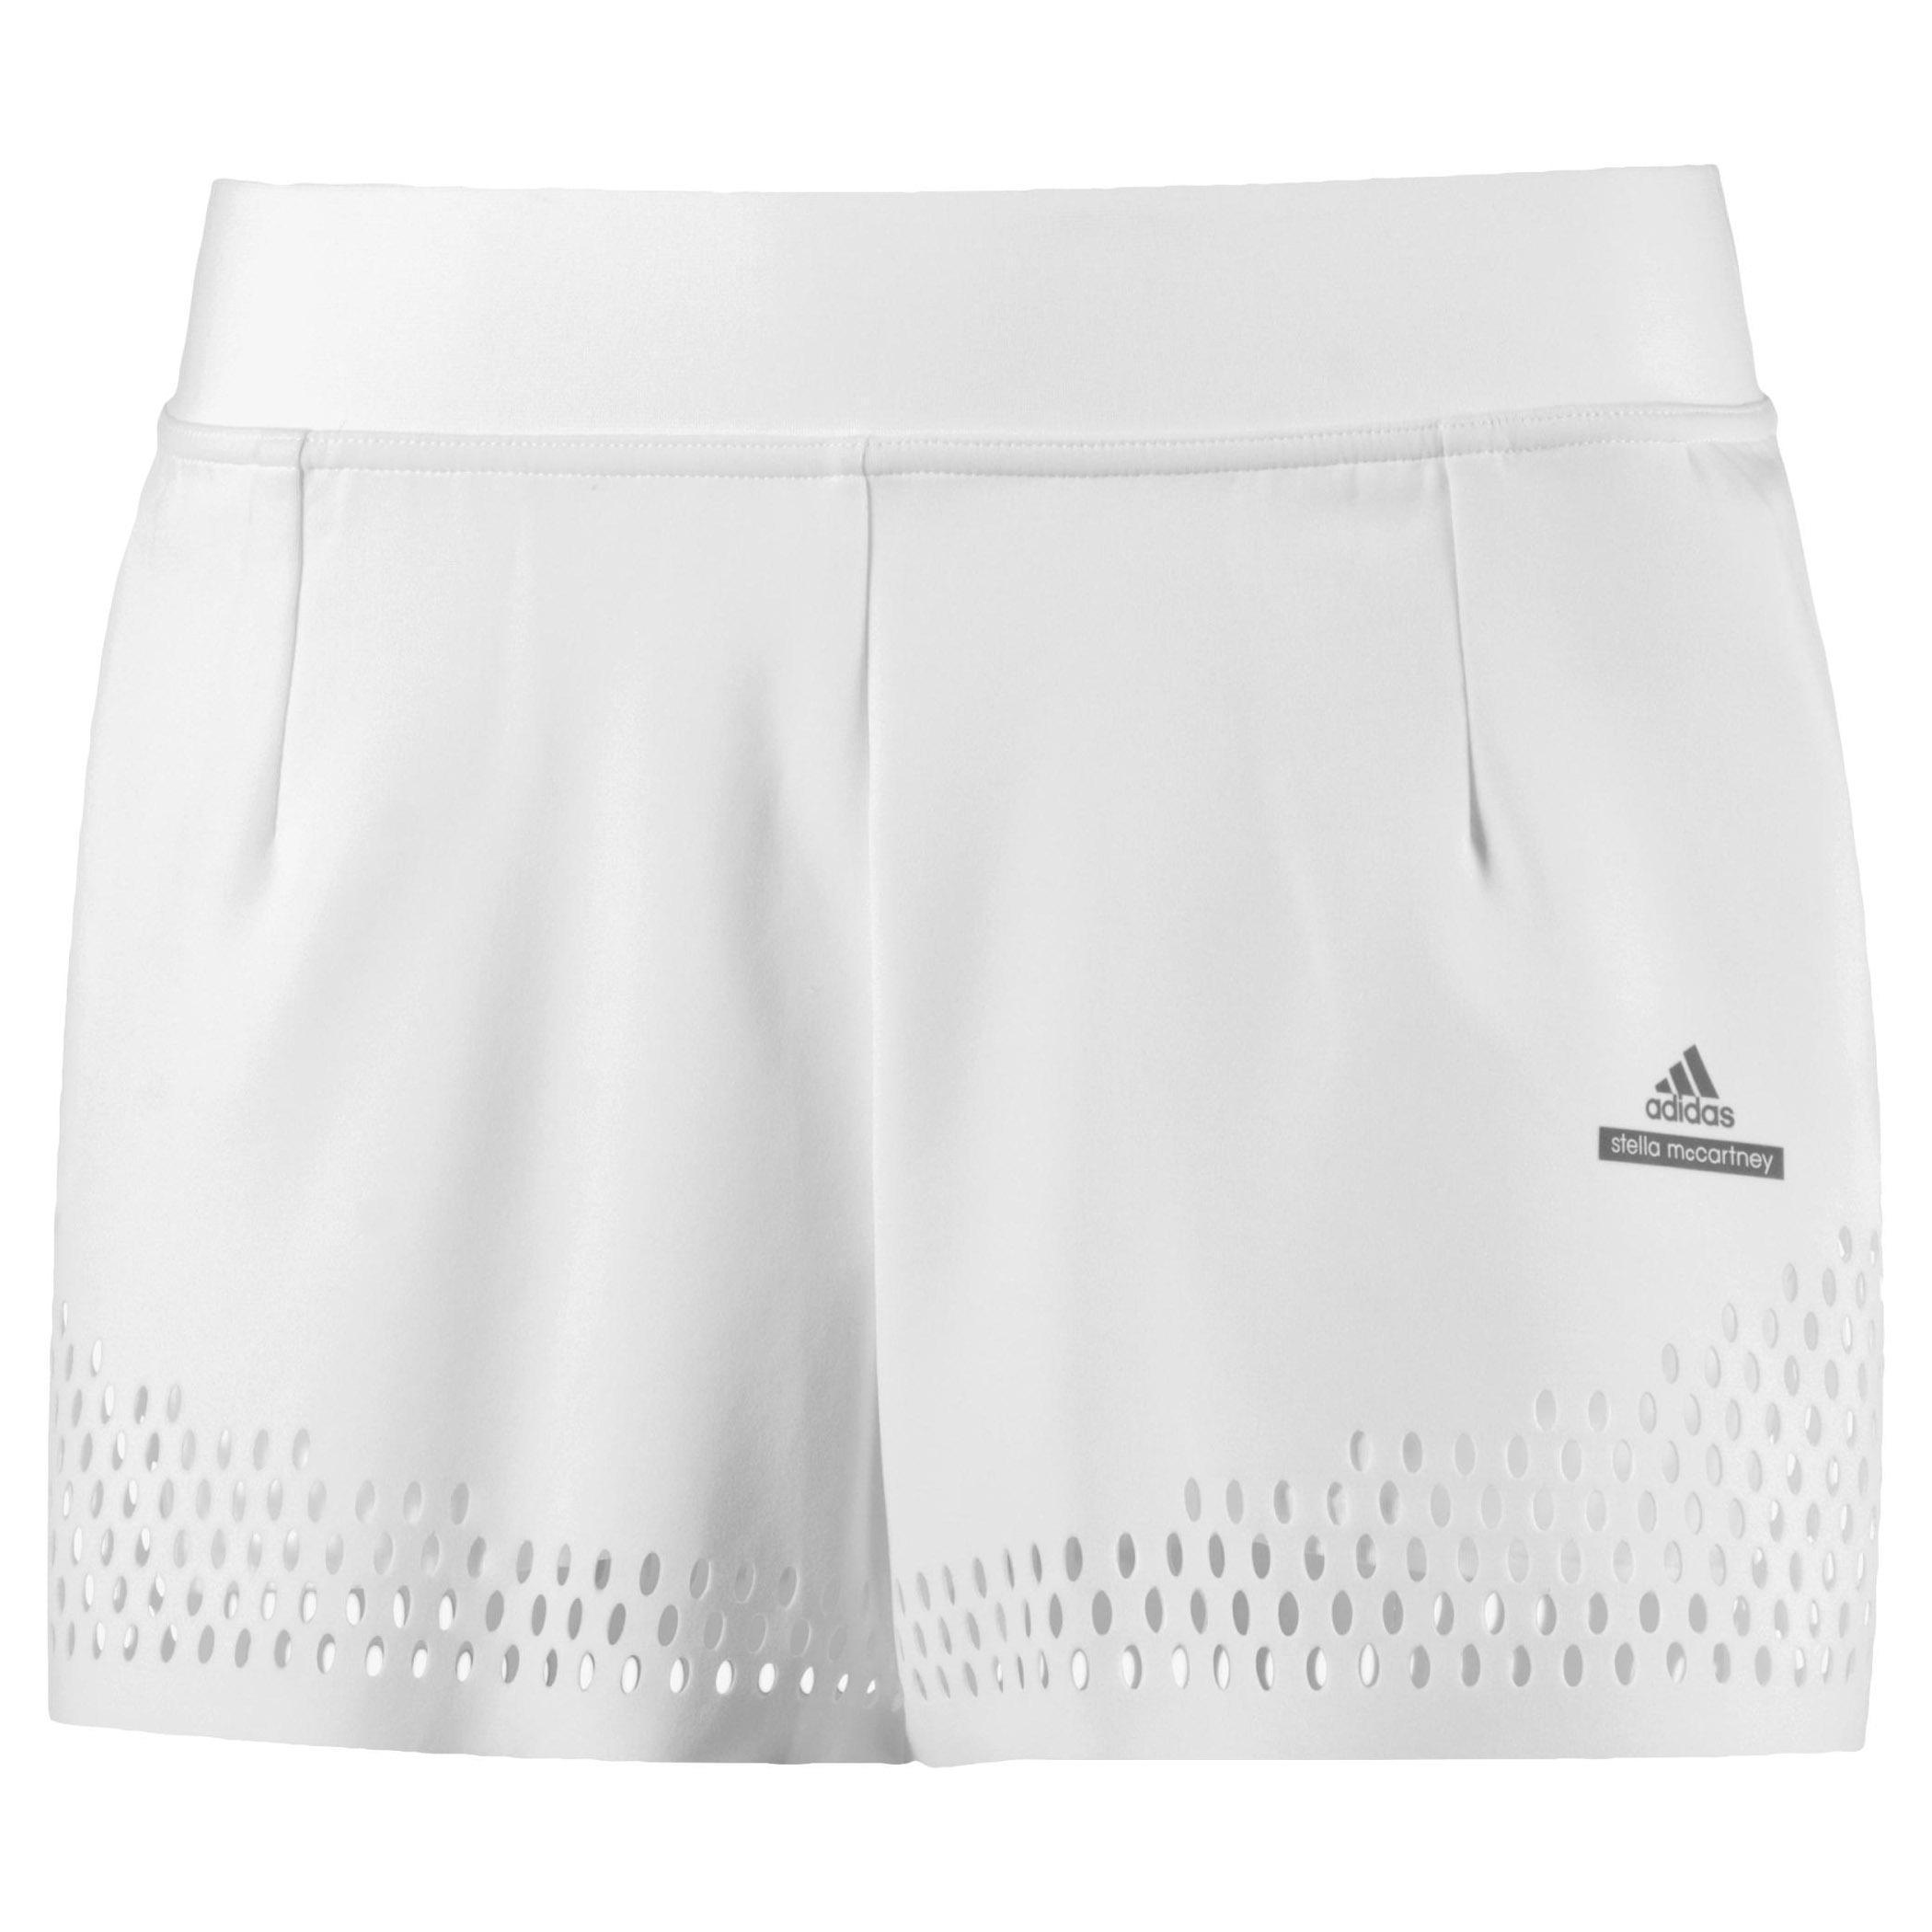 new product 5dbe5 bbb48 Adidas Womens Stella McCartney Barricade Shorts - White - Tennisnuts.com